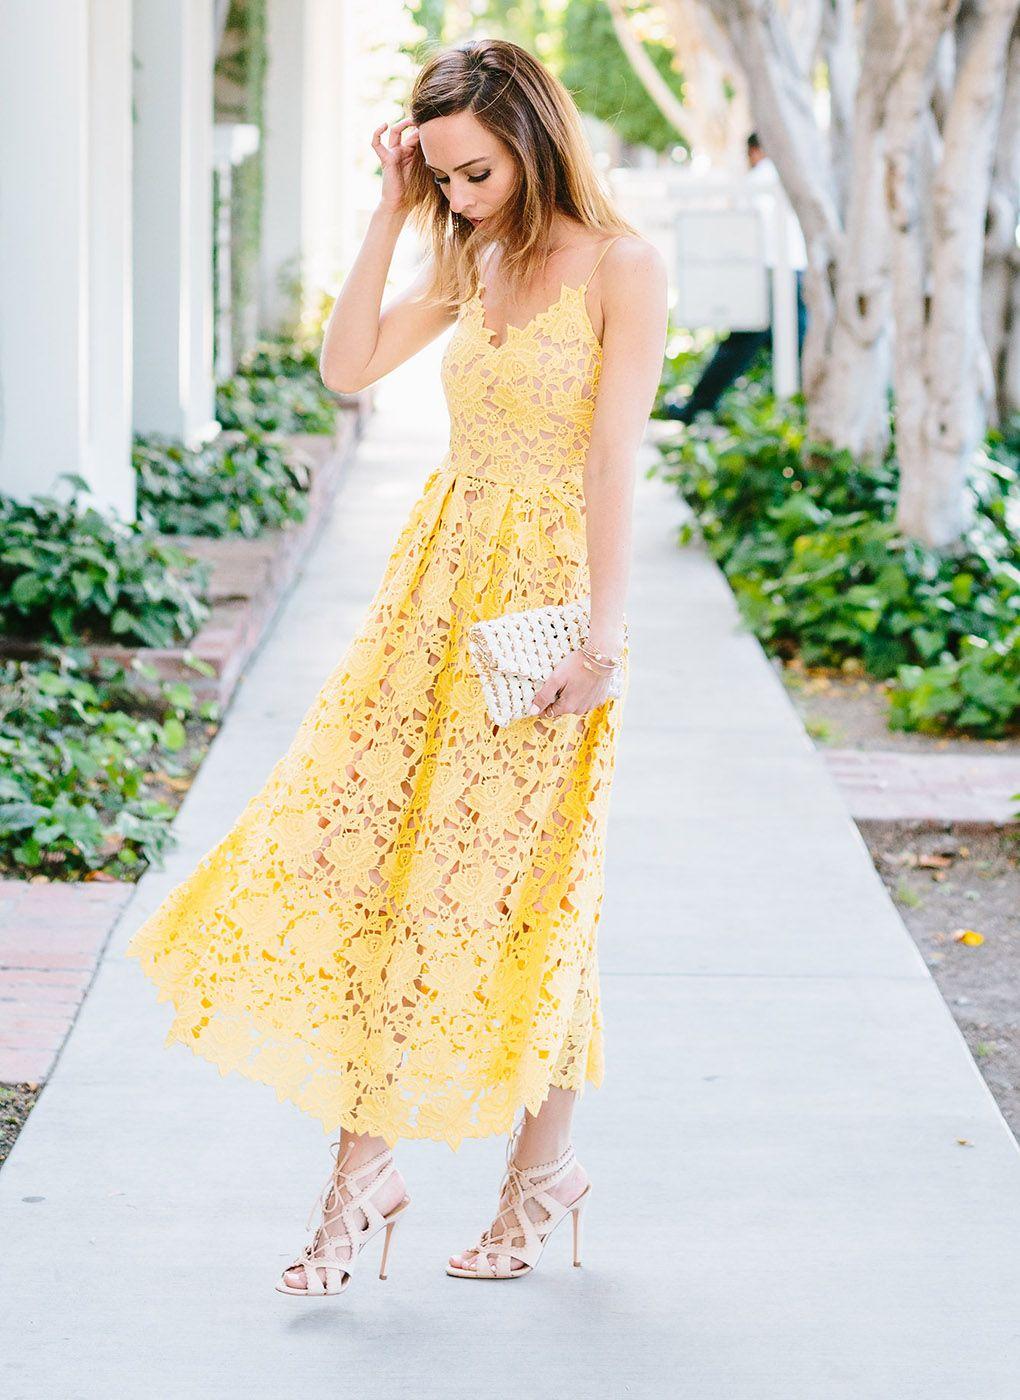 Ootd sydne style is fresh as a daisy in summerus it dress stylish